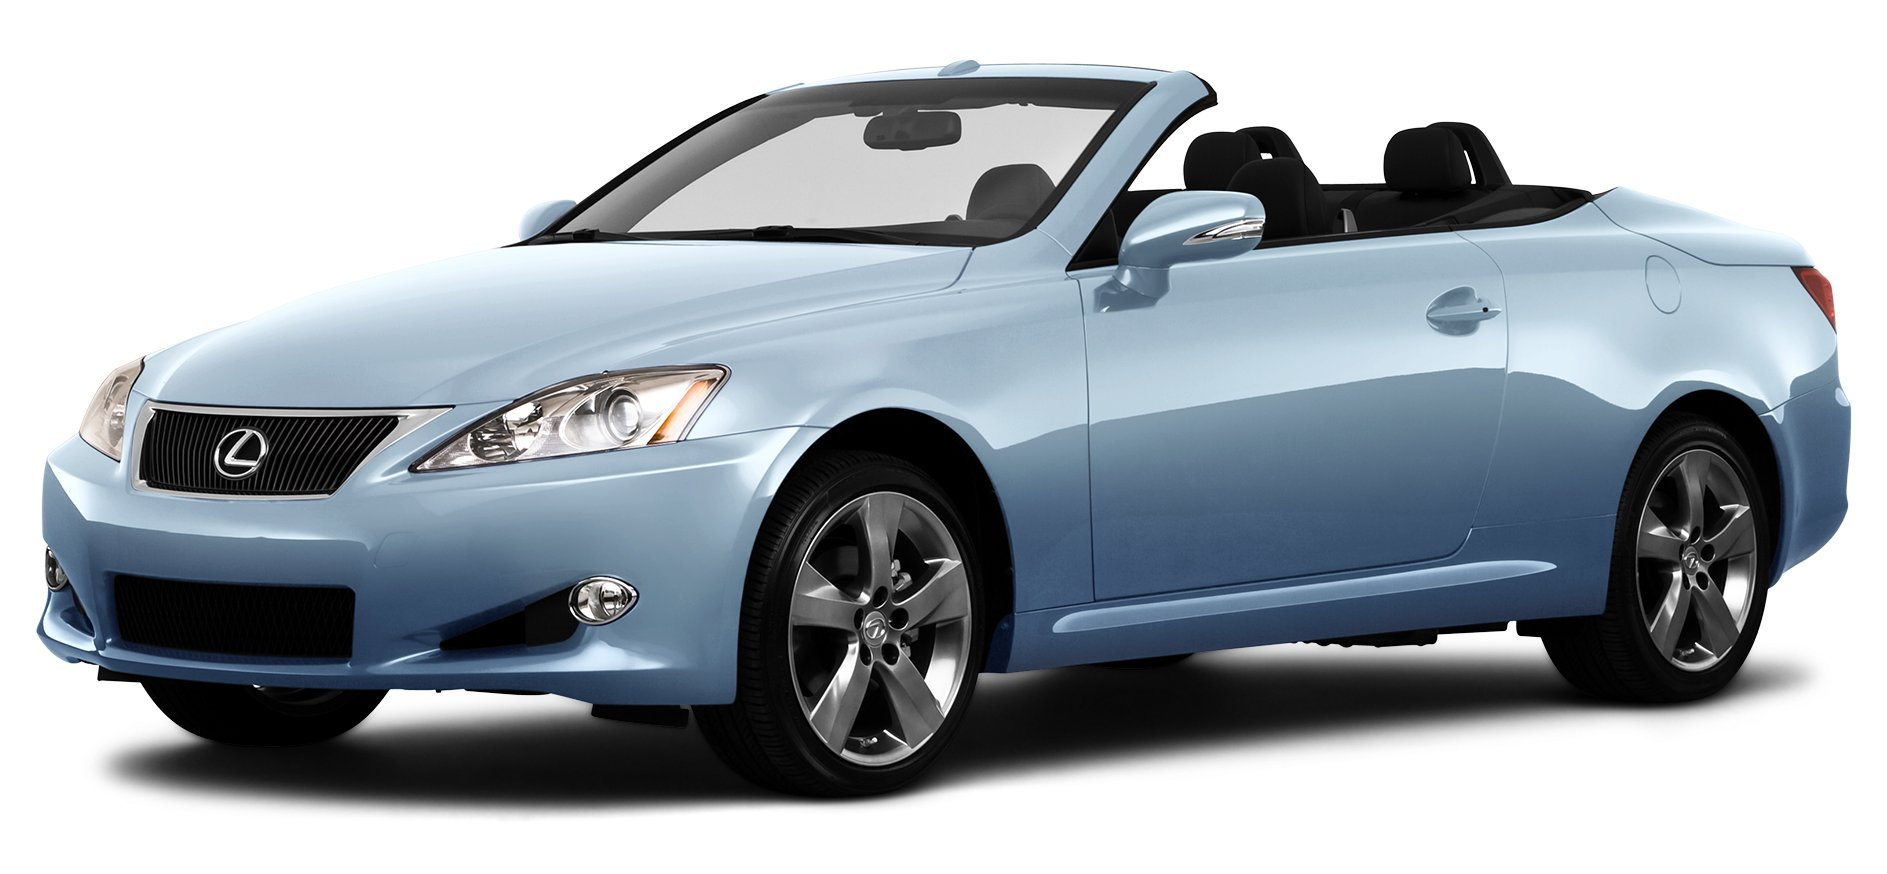 2010 Hyundai Genesis Coupe, 2-Door 2.0T Automatic Transmission, 2010 Lexus IS250, 2-Door Convertible Automatic Transmission ...